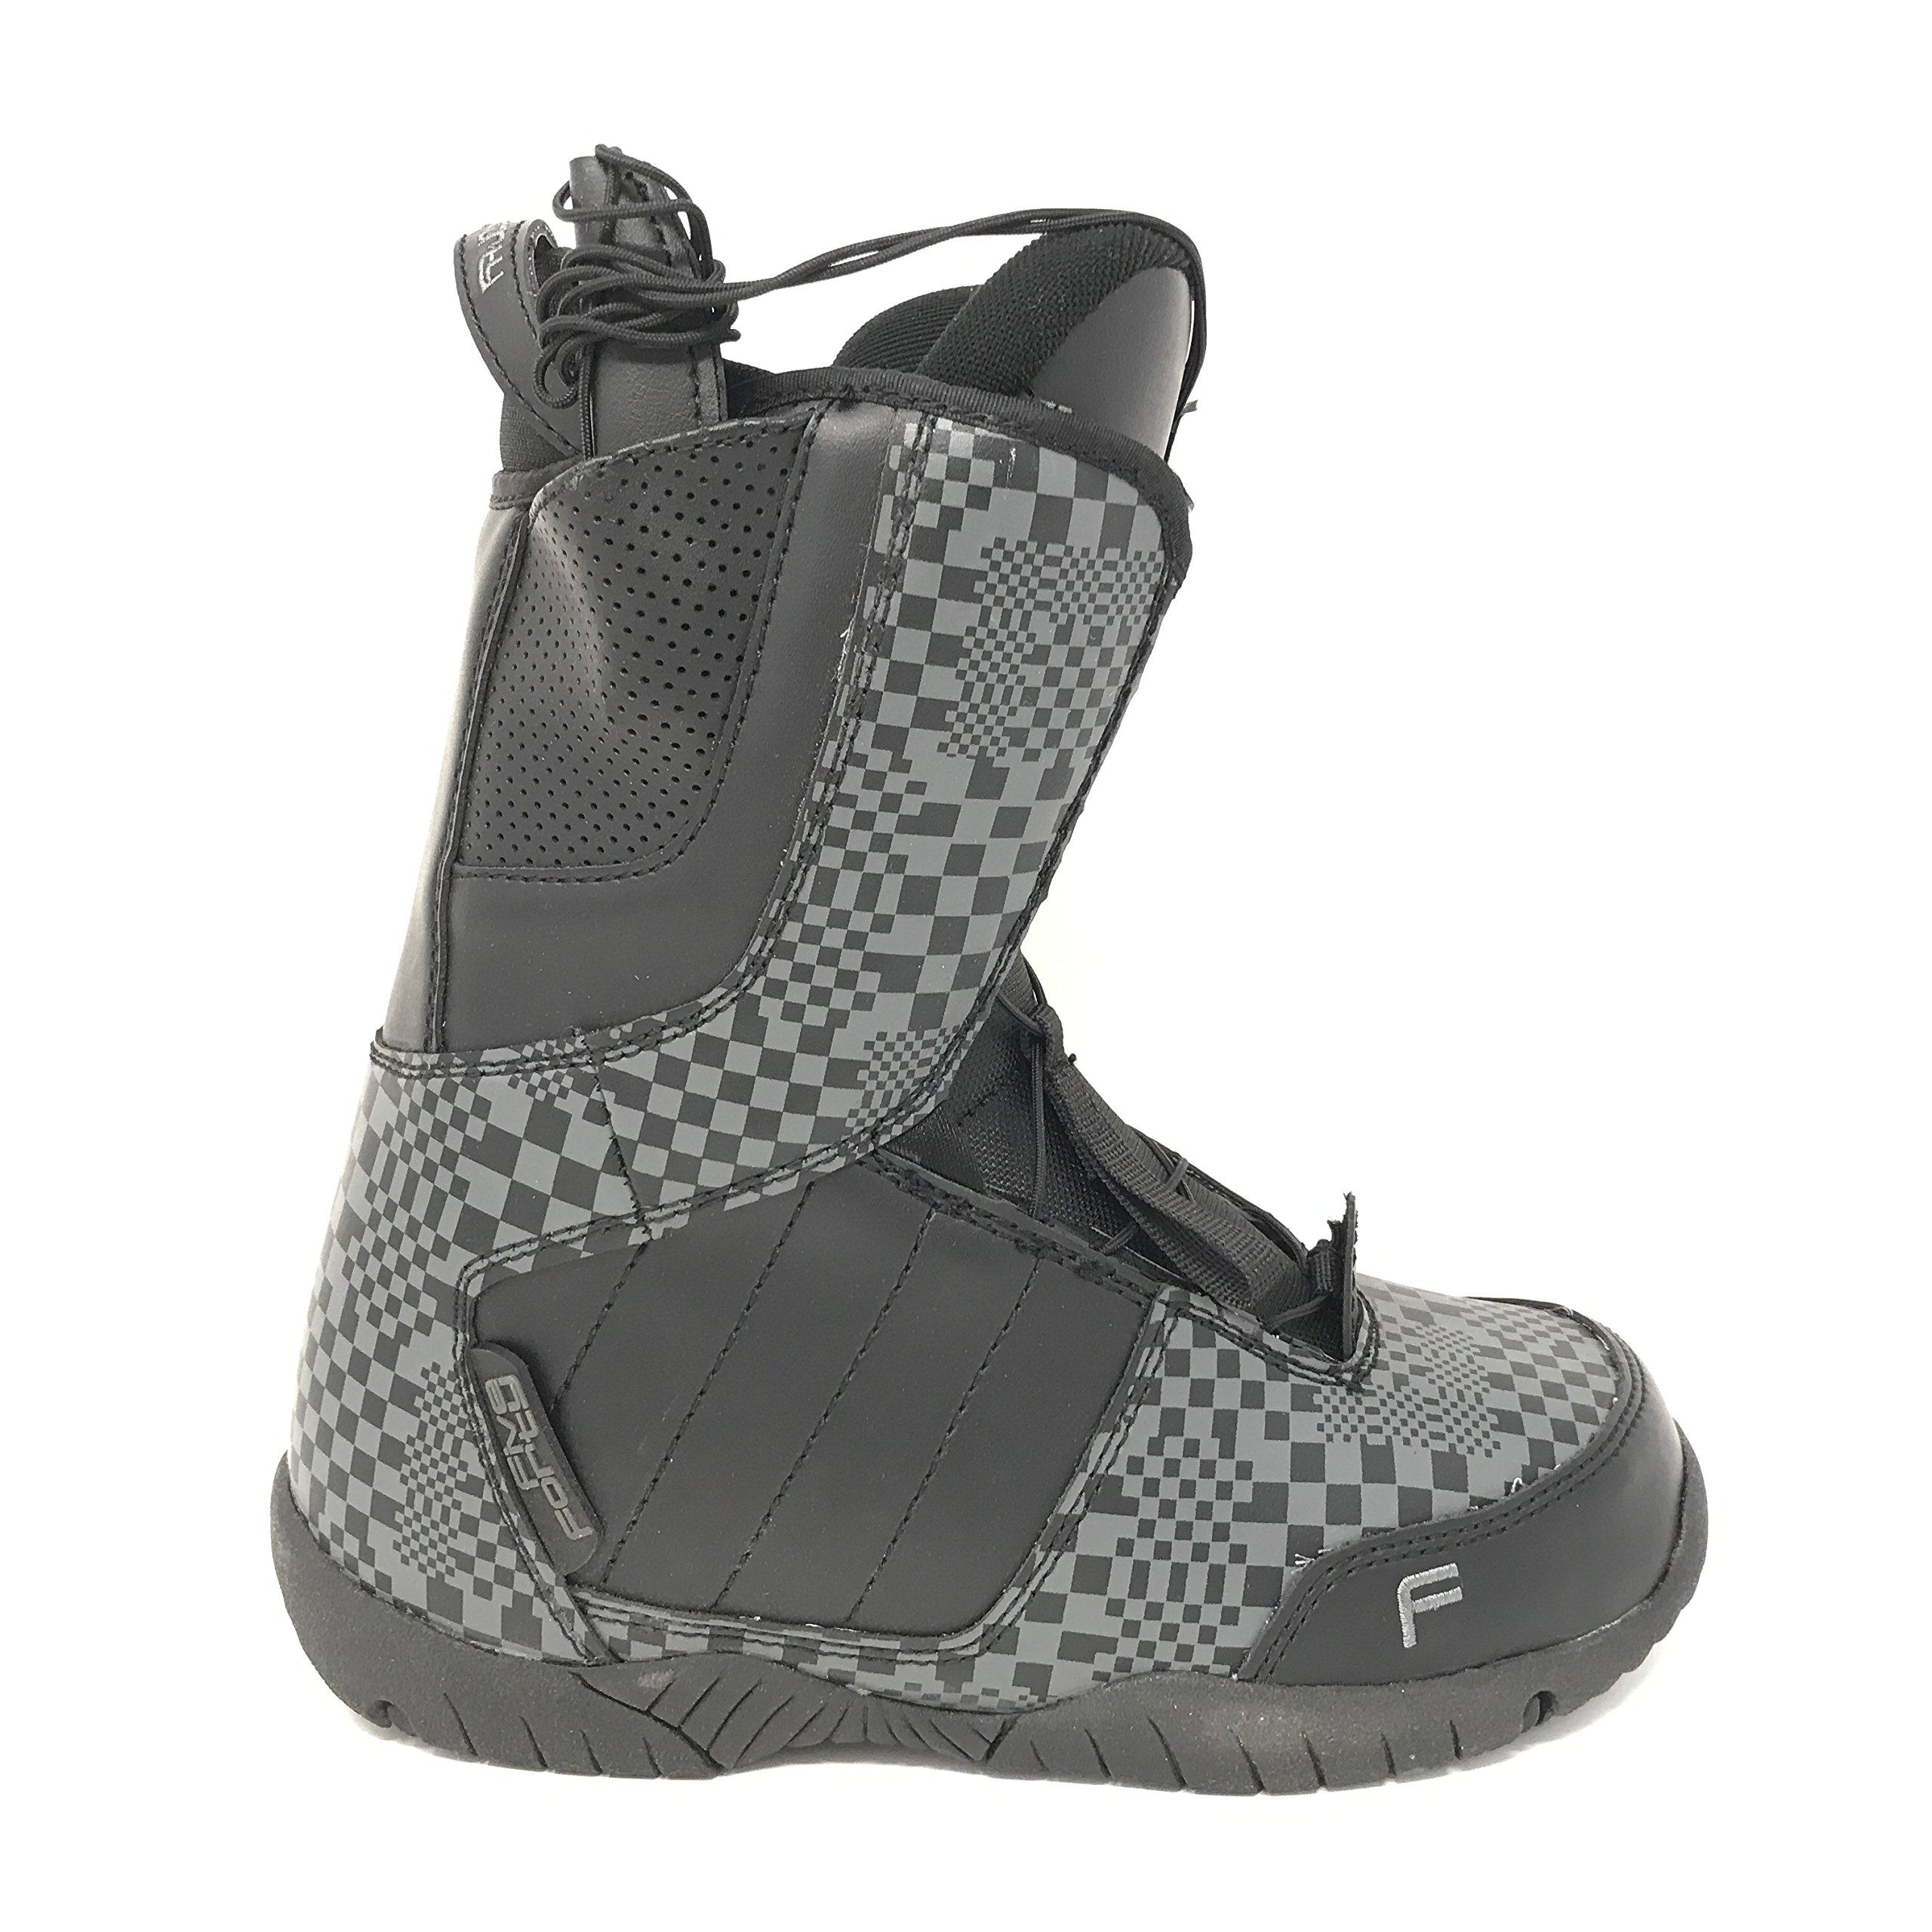 Snowjam Maverick Men's Snowboard Boots Size 8 by SnowJam